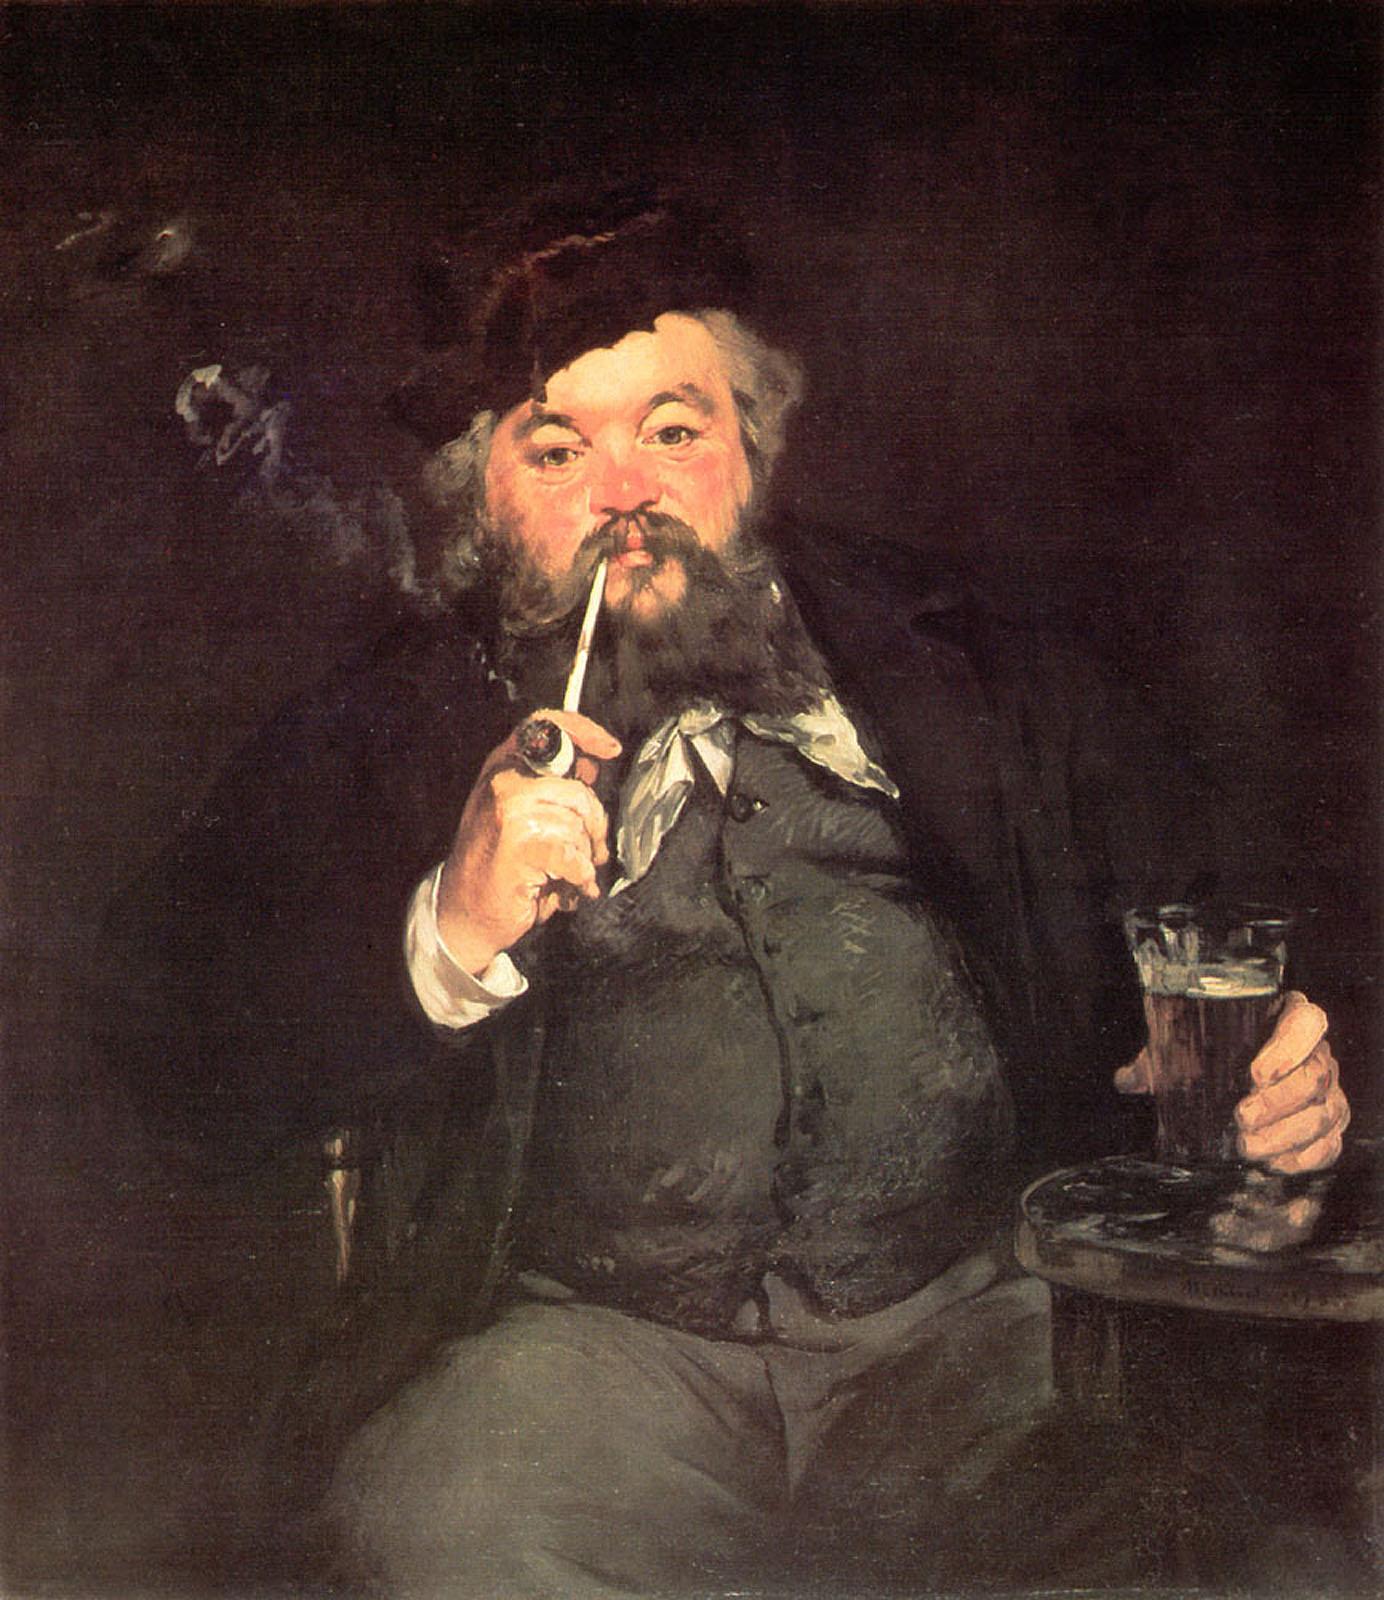 Oktoberfest Paintings: Edouard Manet, A Good Glass of Beer, 1873, Philadelphia Museum of Art, Philadelphia, PA, USA.